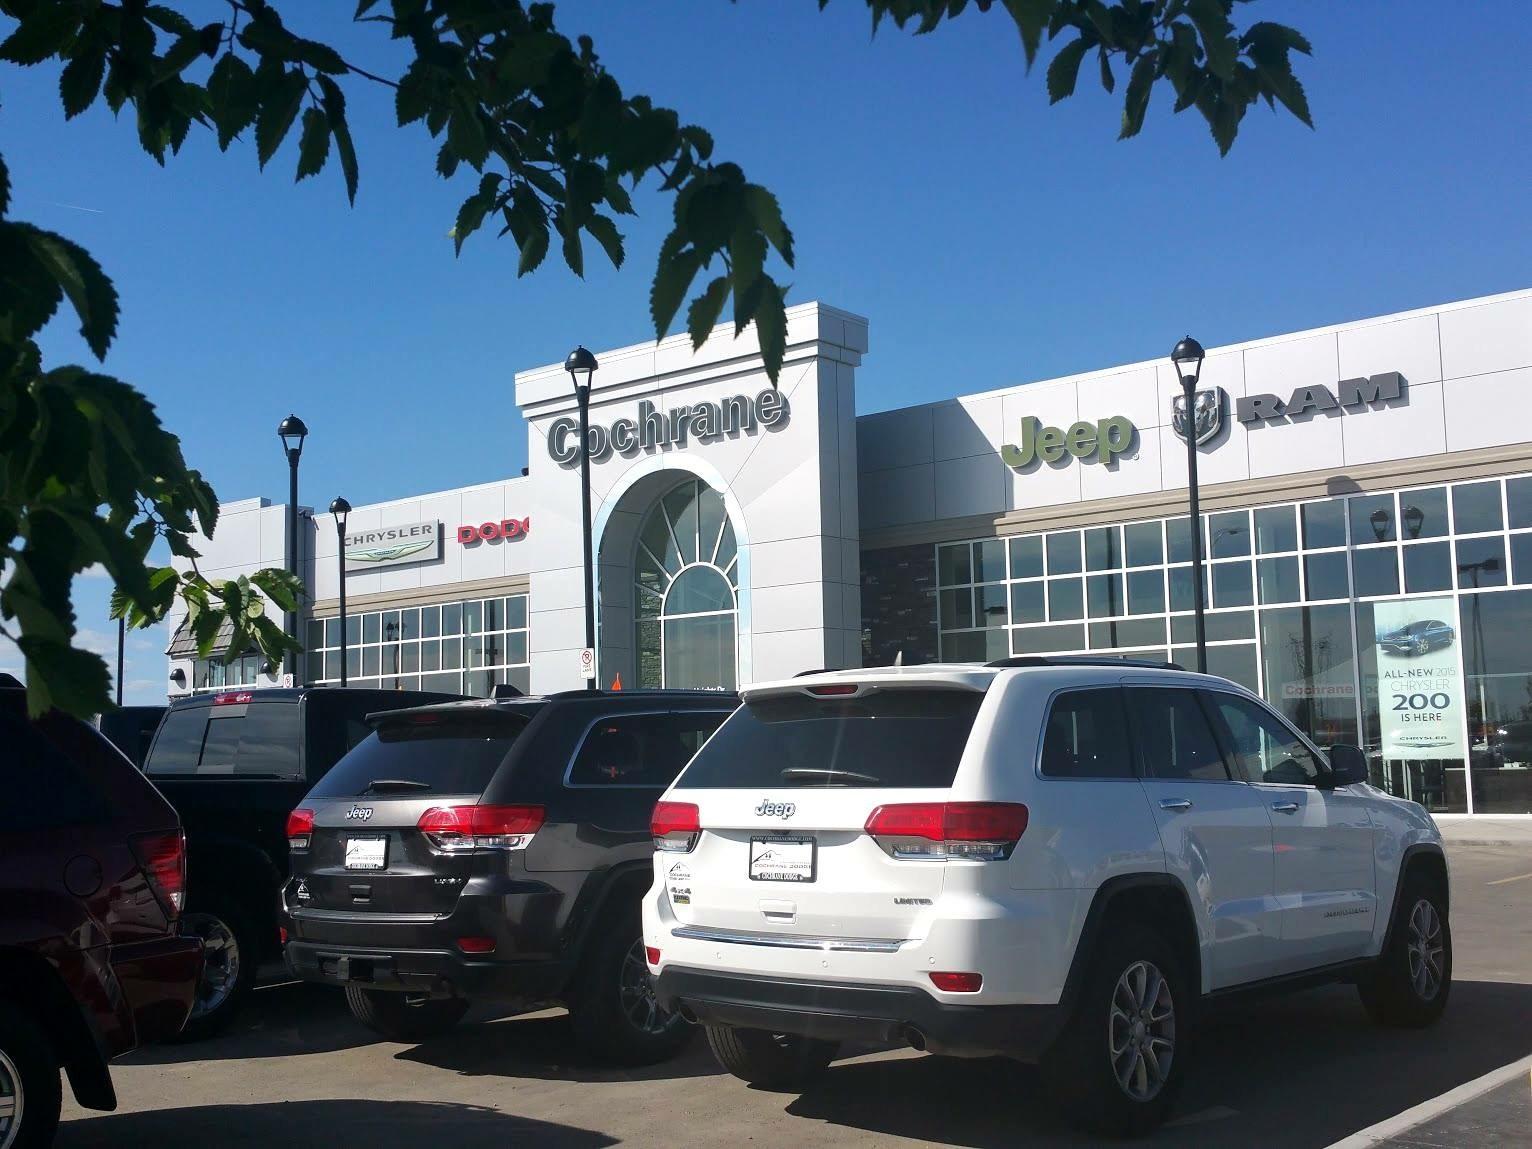 Cochrane Dodge Your Central Chrysler, Dodge, Jeep U0026 RAM Dealership Between  Calgary U0026 Canmore!